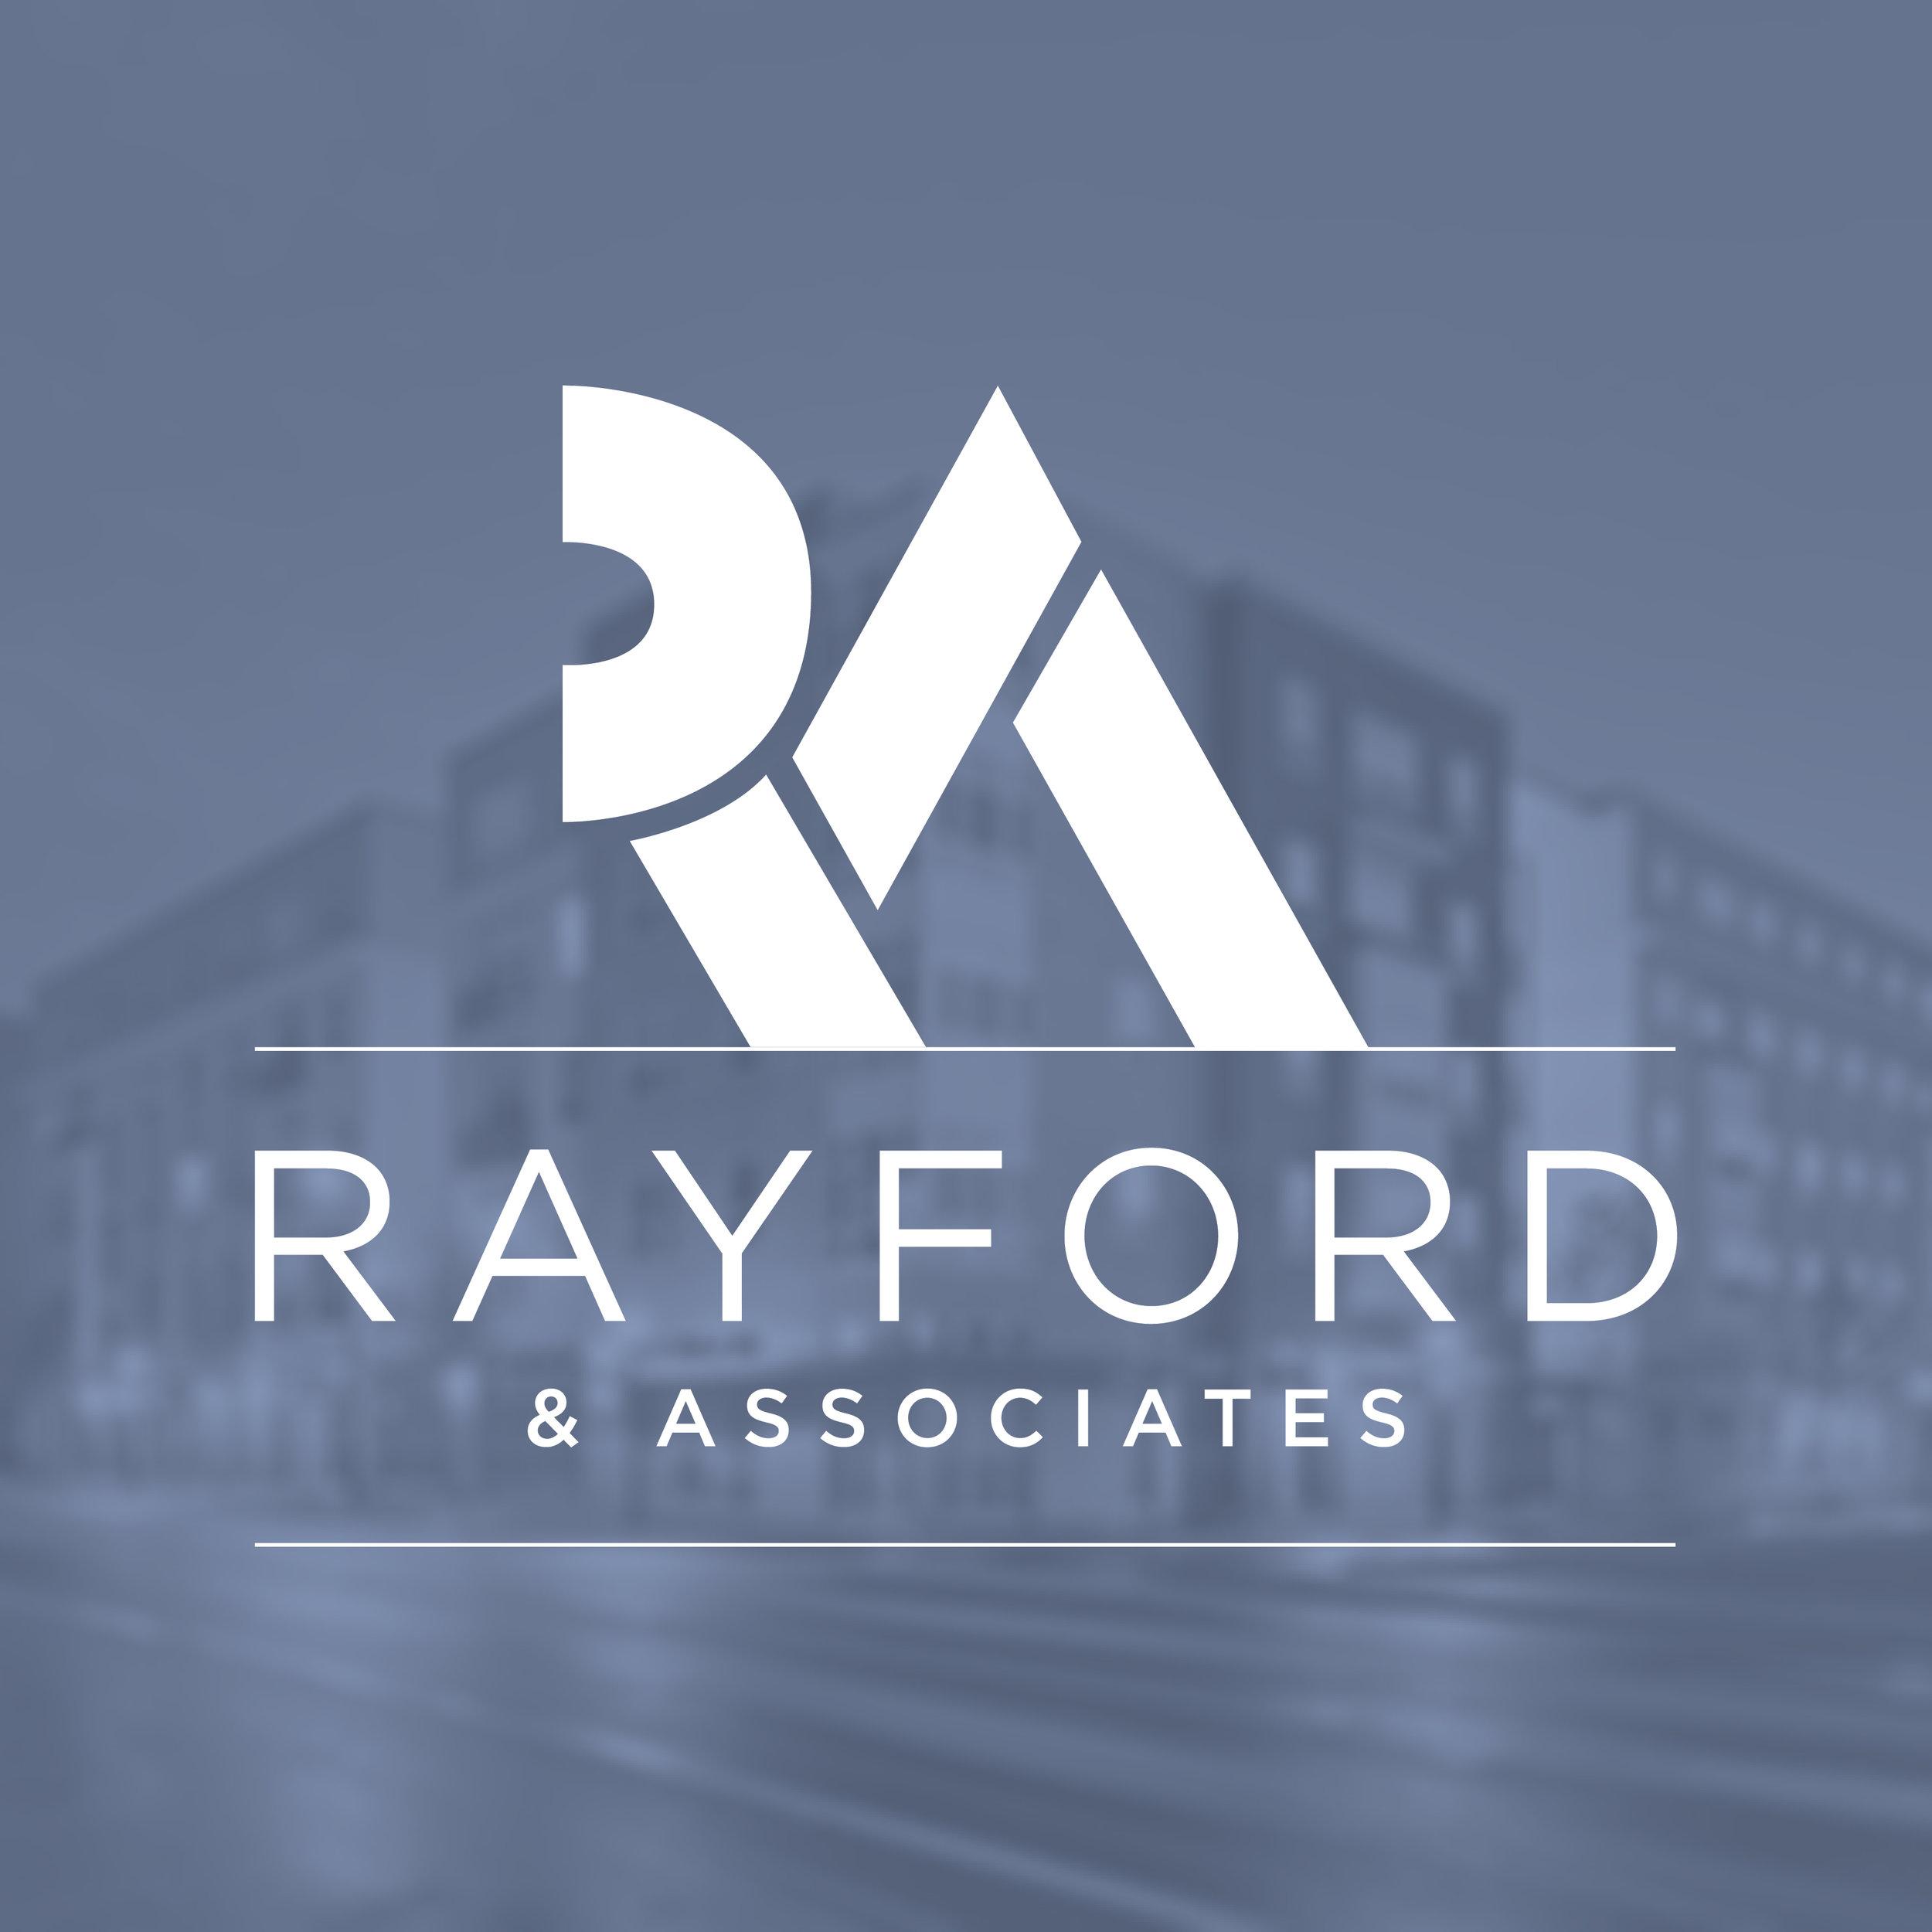 rayford post4.jpg